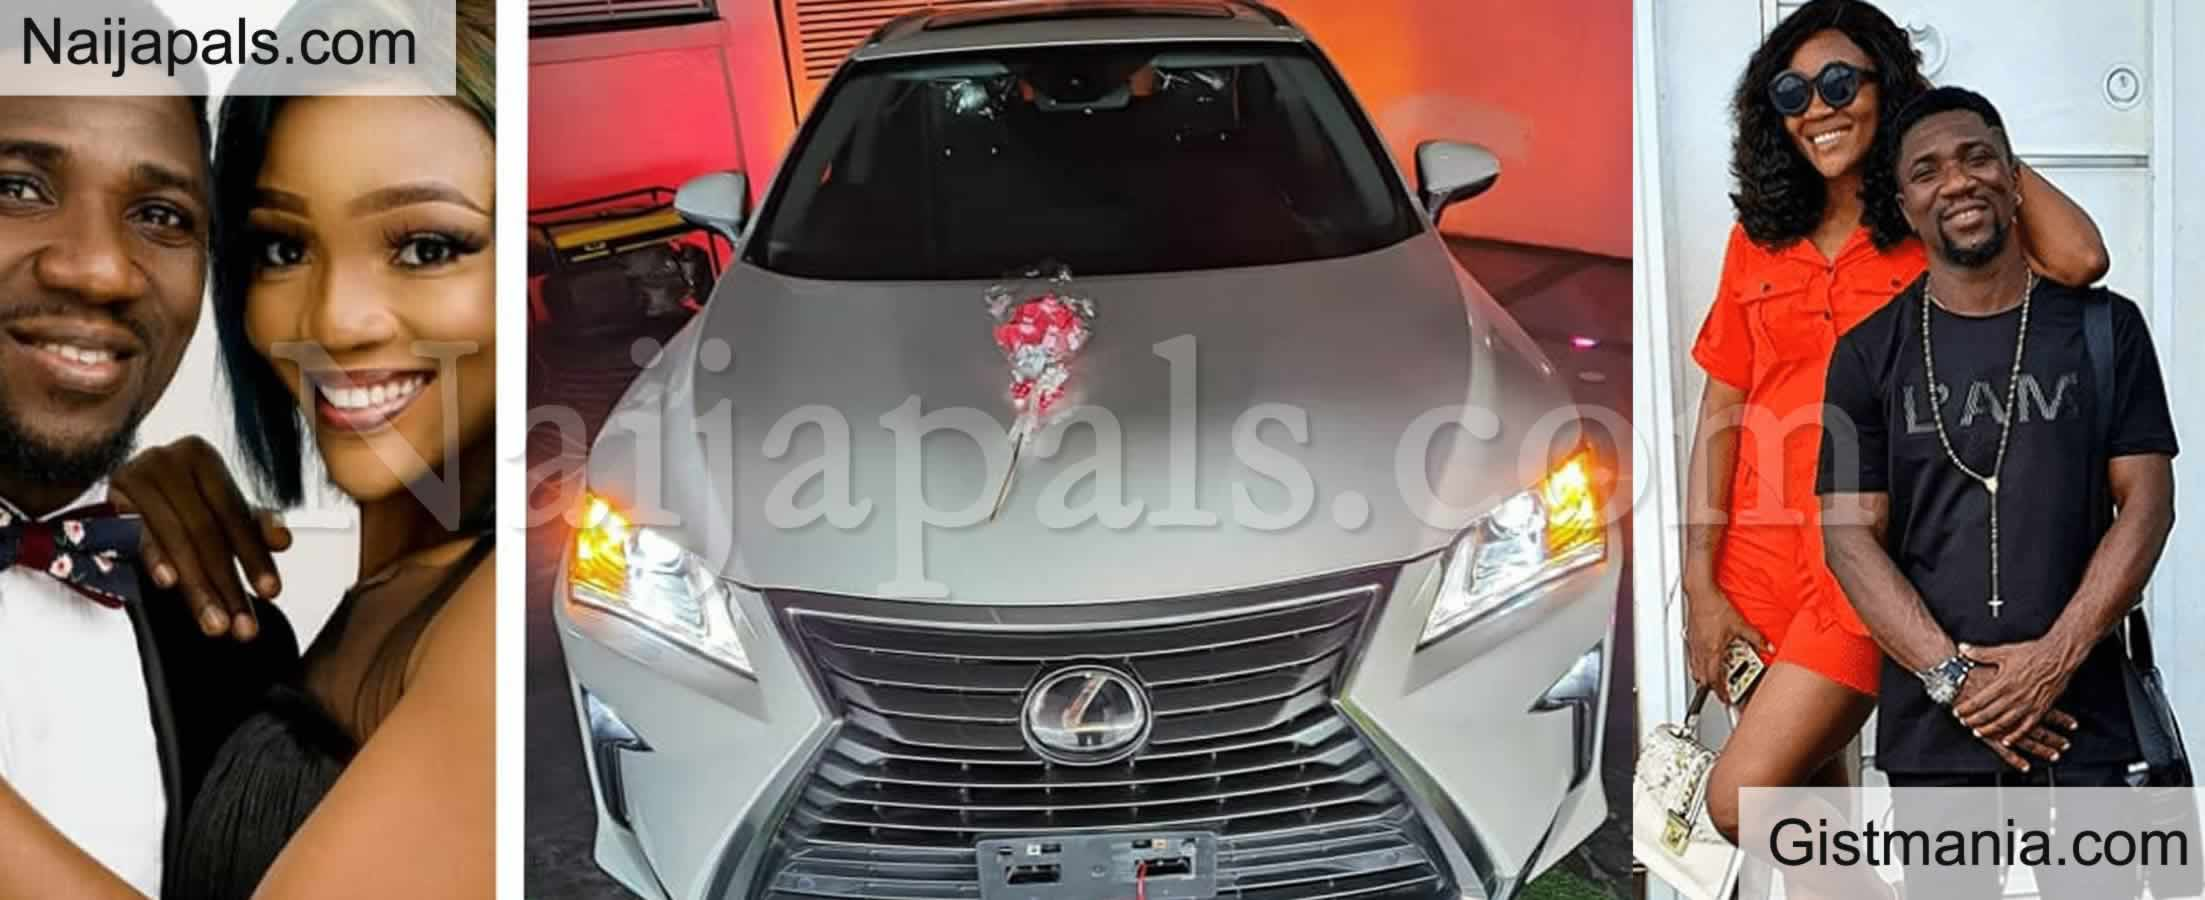 <img alt='.' class='lazyload' data-src='https://img.gistmania.com/emot/love.gif' /> <b>Nigerian Comedian Ogusbaba Surprises His Wife With a Lexus SUV</b> (Photos)